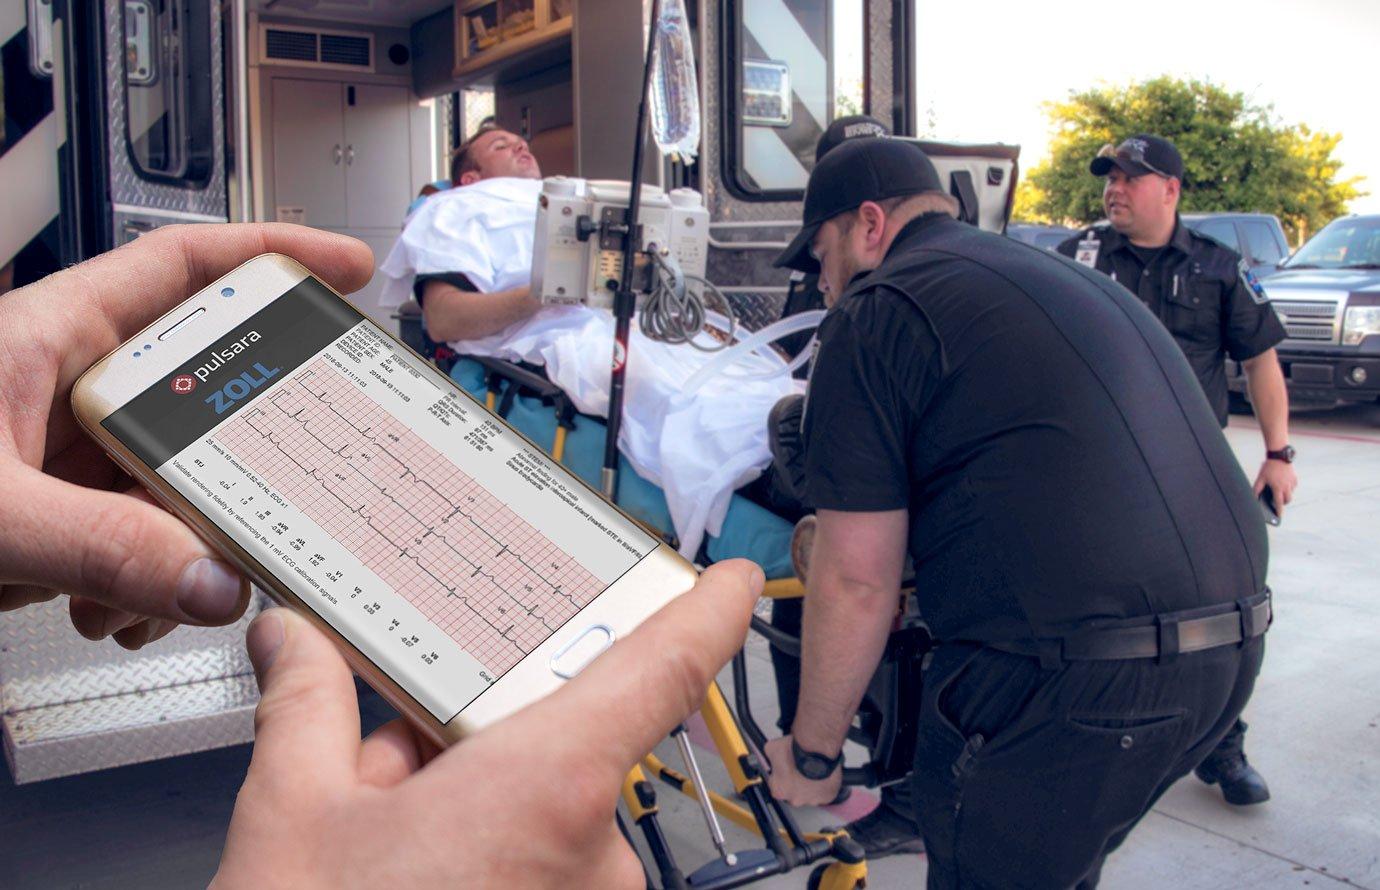 medics-ecg-device-ecg-zoll@1380